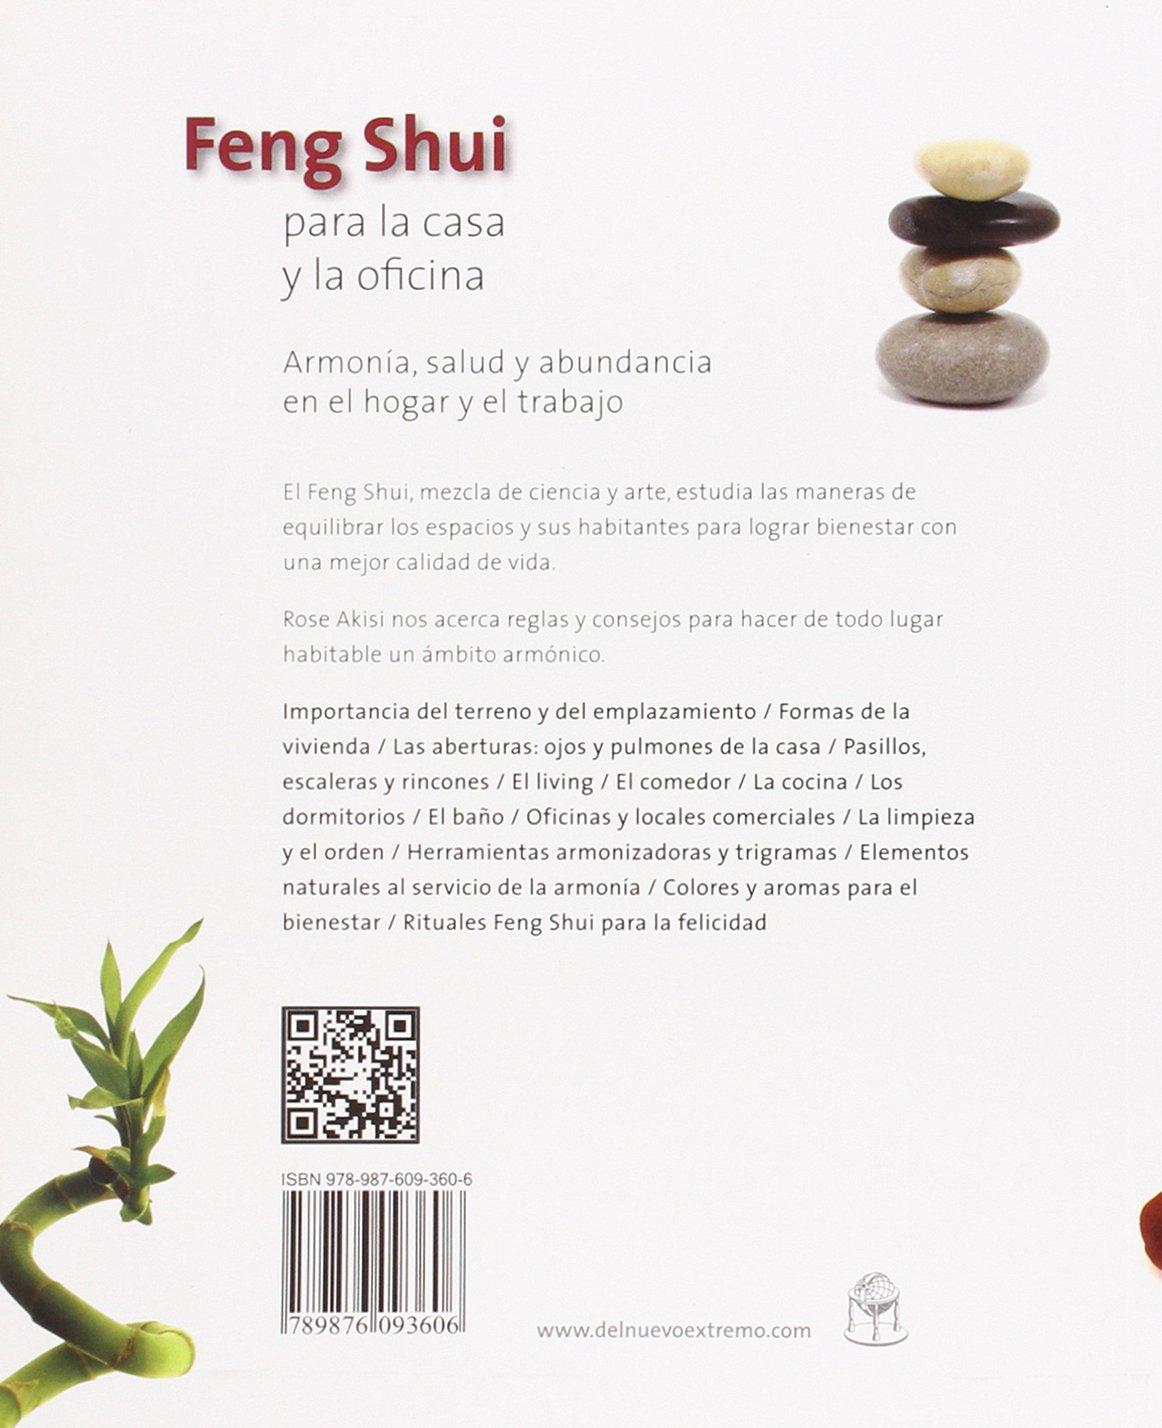 Reglas del feng shui feng shui establece bao bao with for Reglas del feng shui en el dormitorio